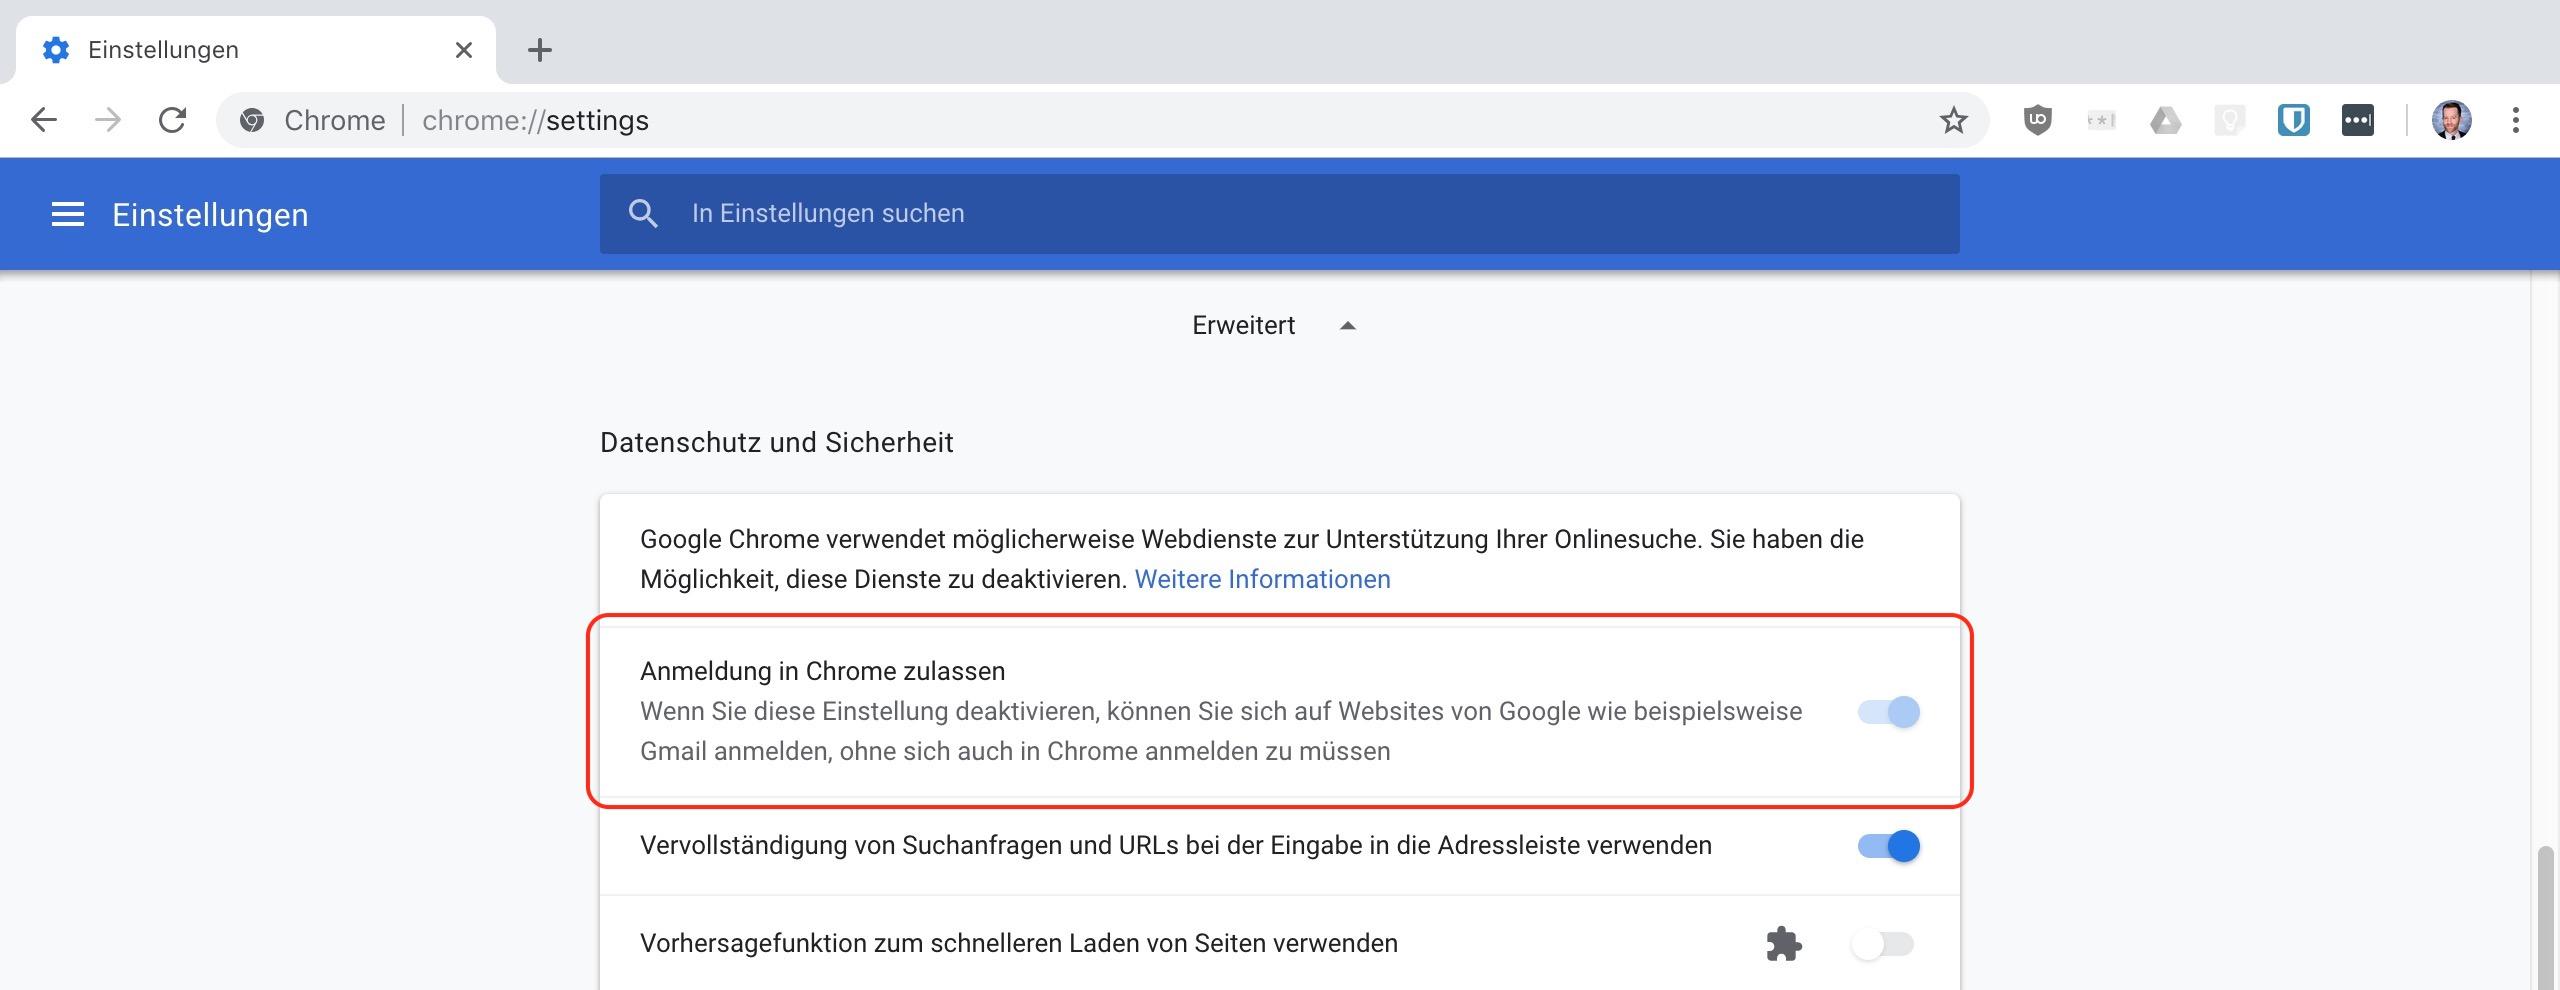 Google Chrome 70 - So deaktivierst du den neuen Anmeldeprozess